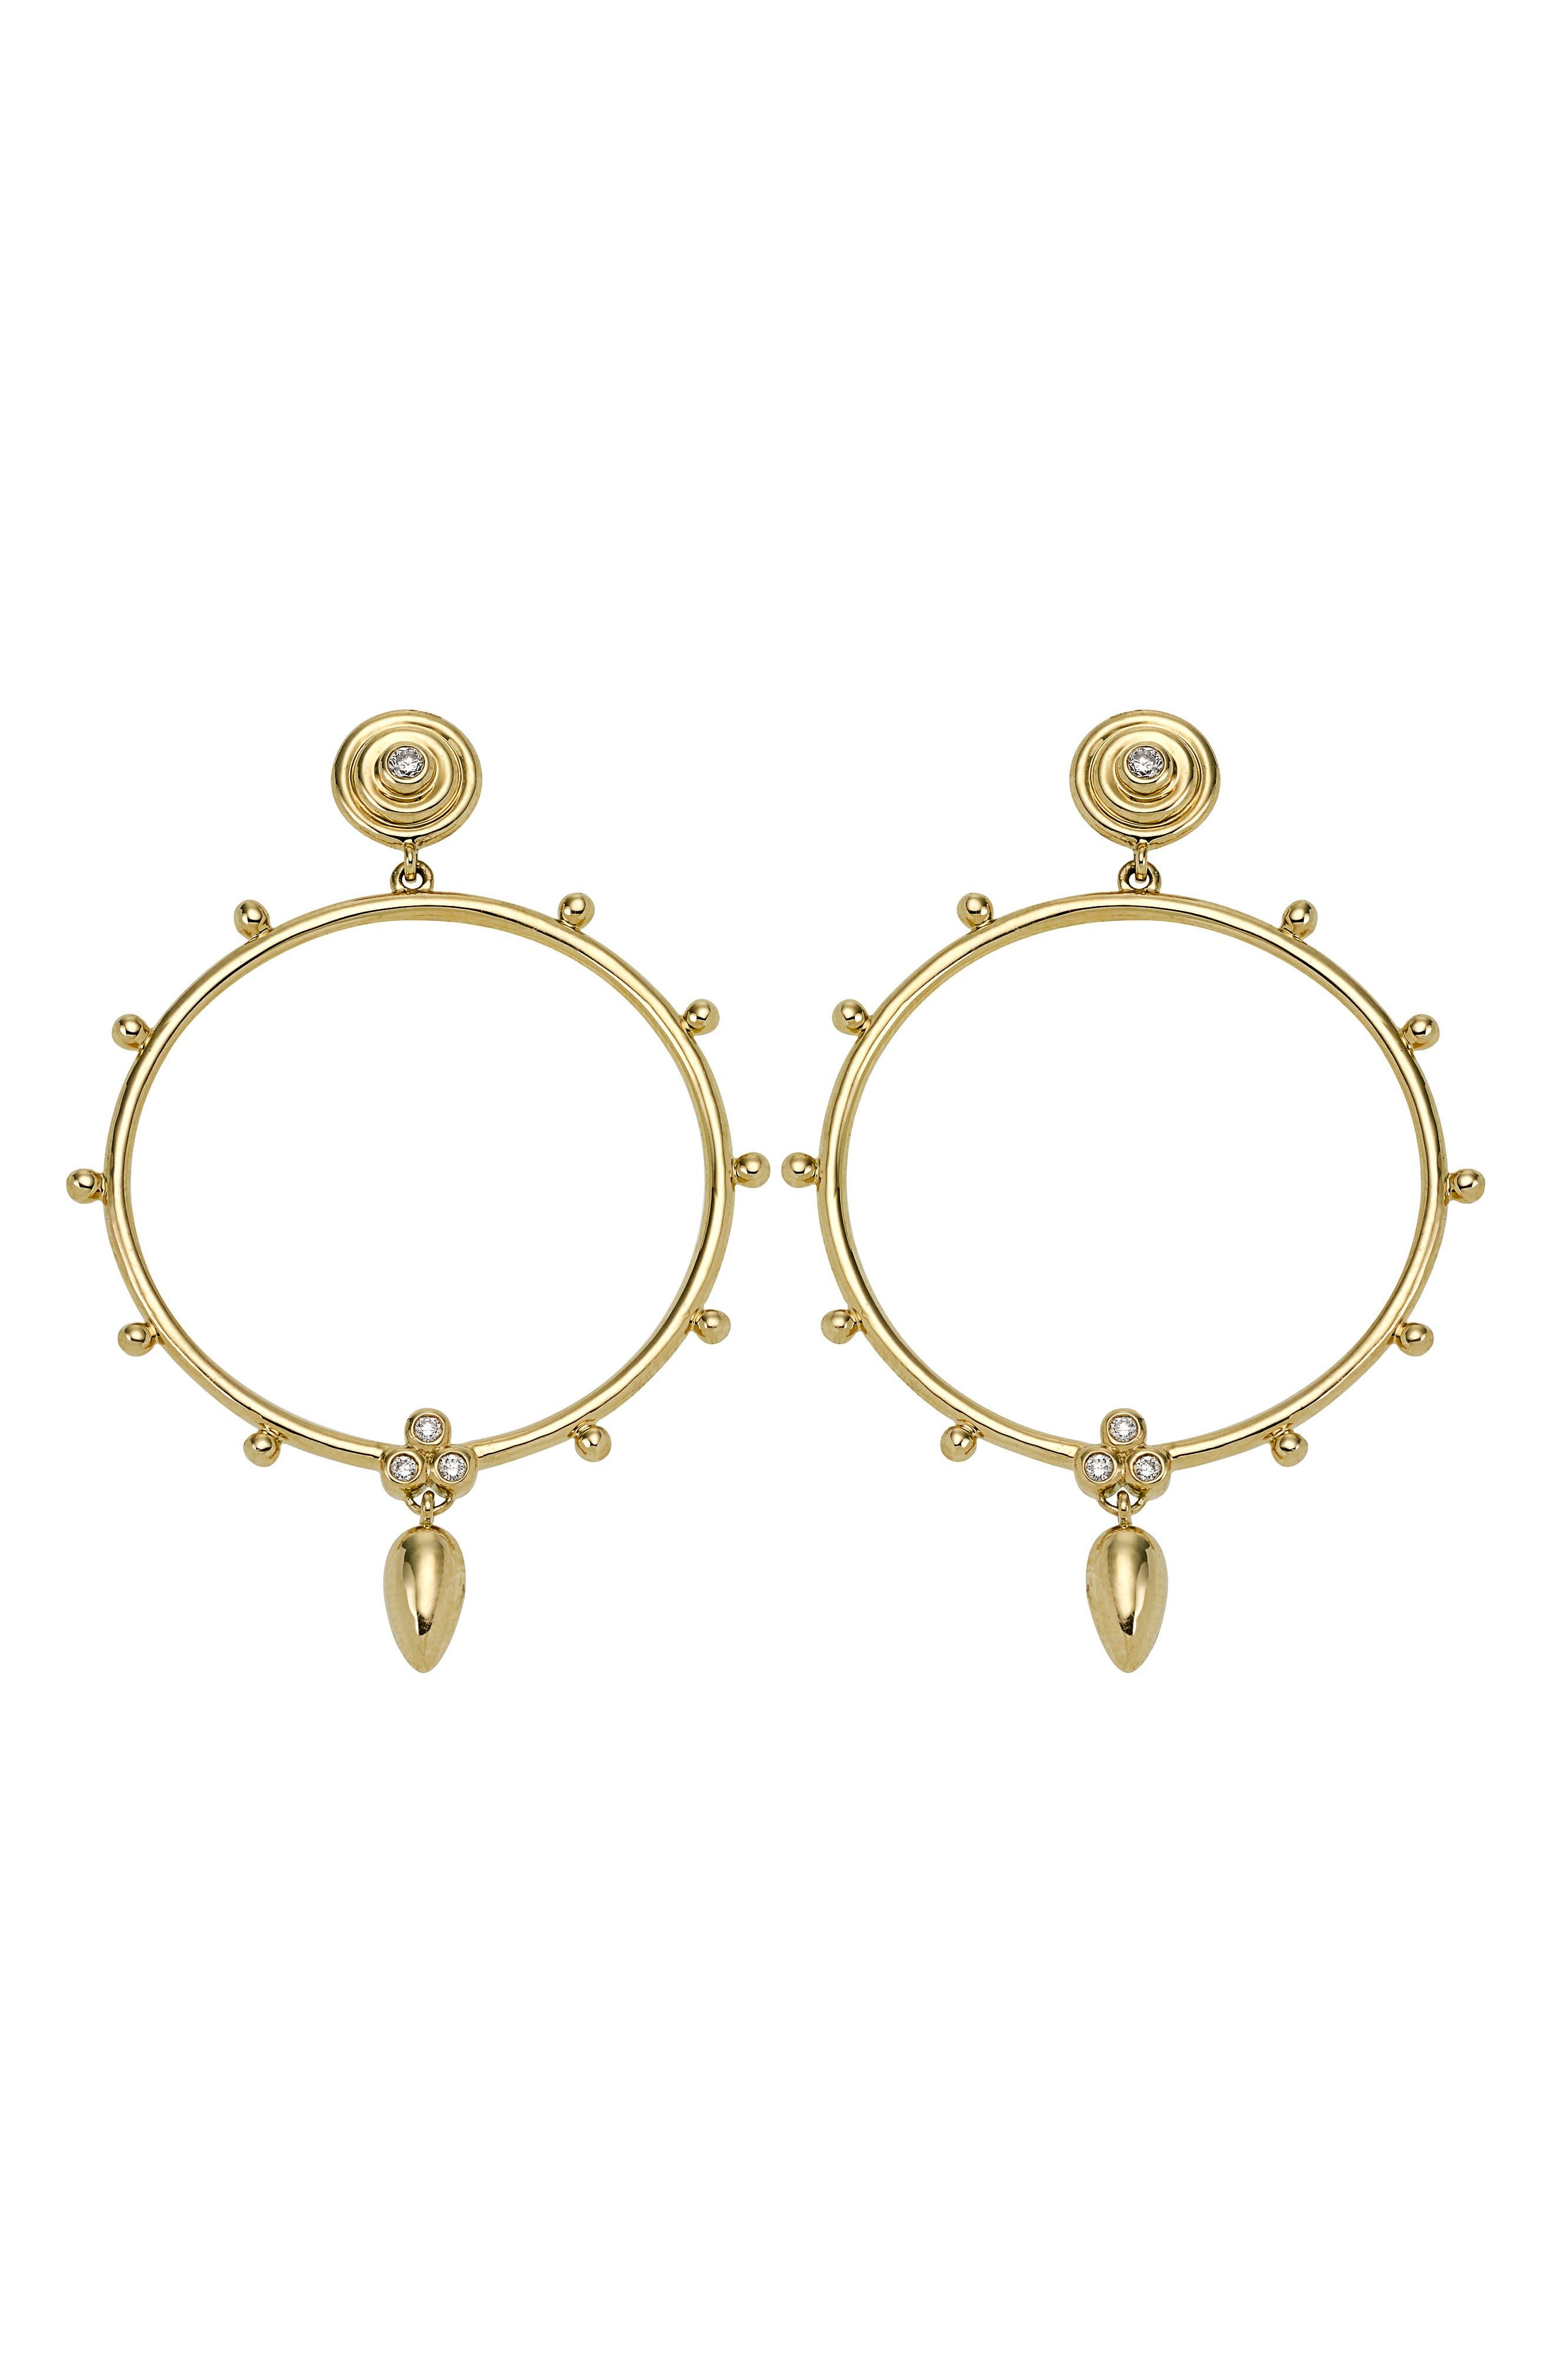 18K Gold & Diamond Circle Anfora Earrings,                         Main,                         color, Yellow Gold